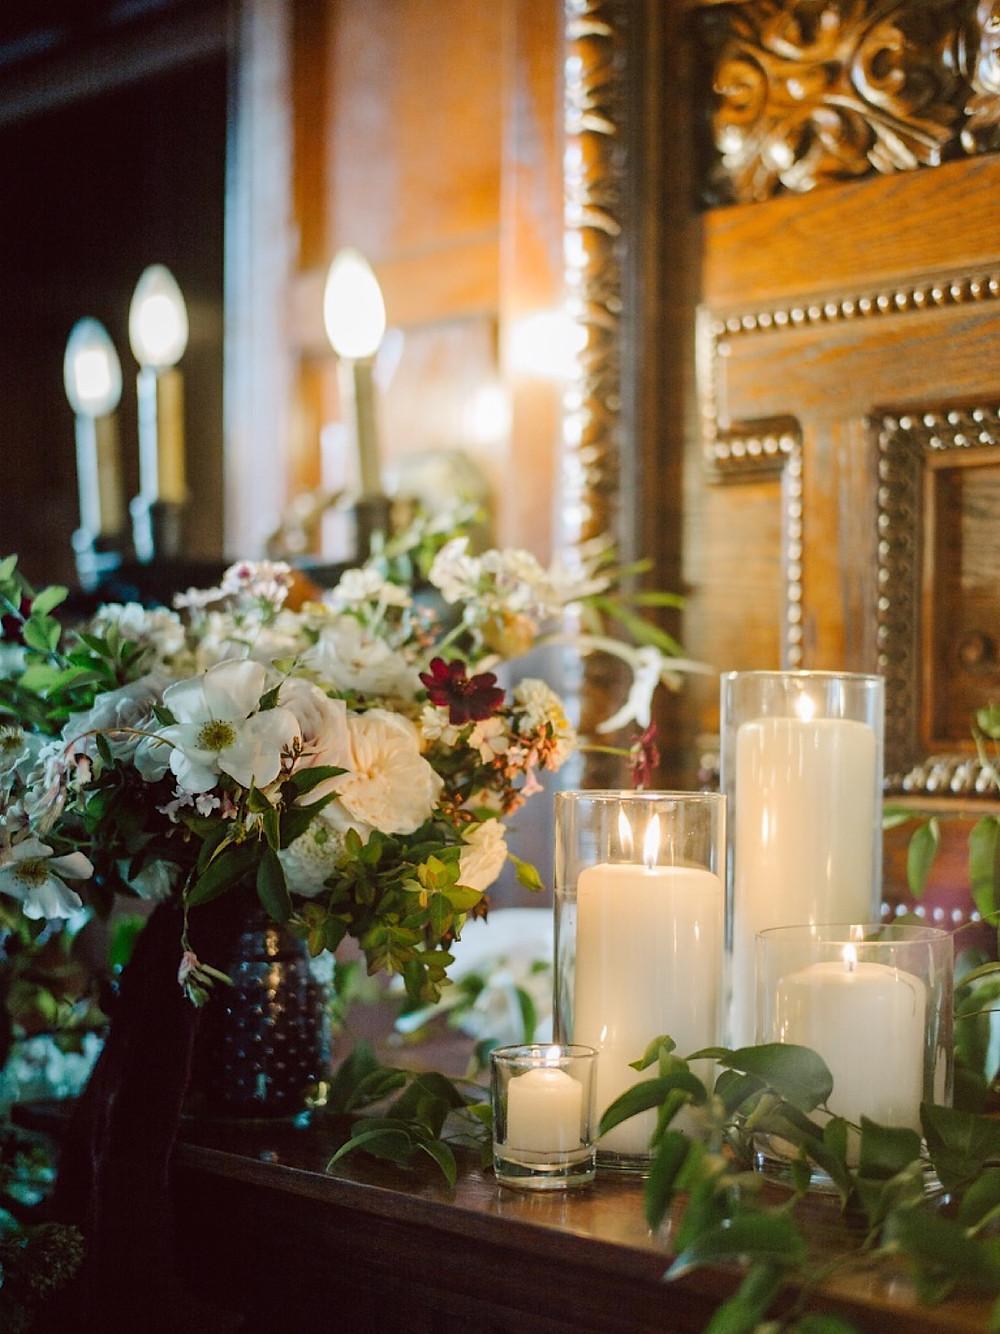 Romantic wedding reception details at Thornewood Castle